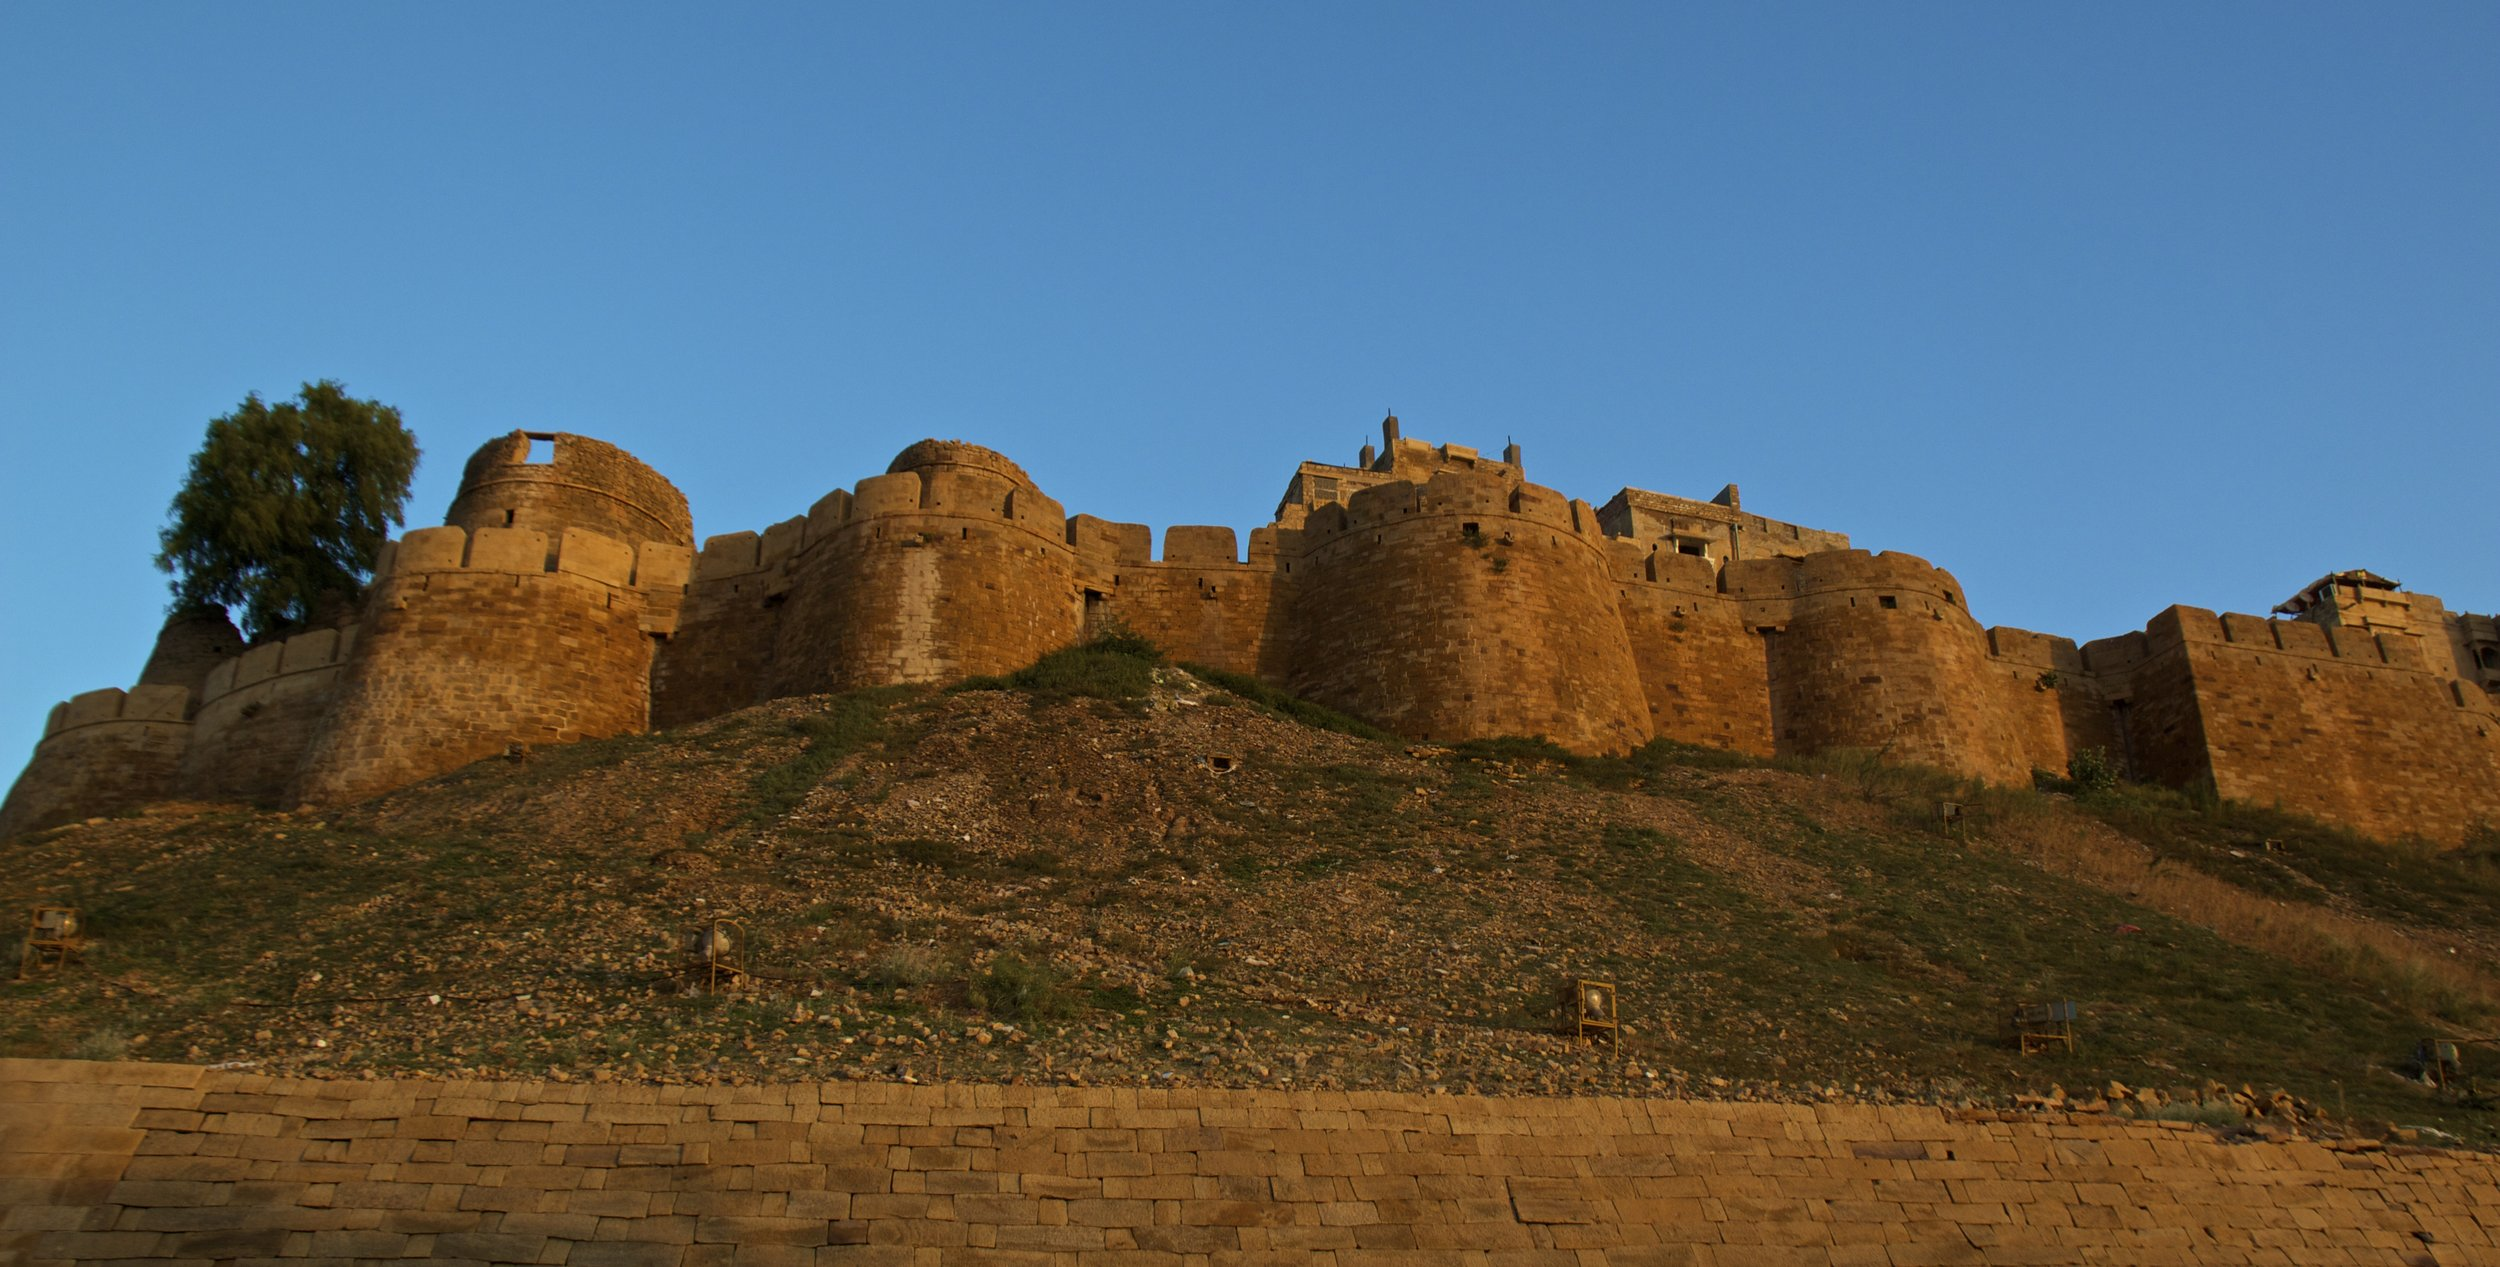 jaisalmer rajasthan india photography 5.jpg